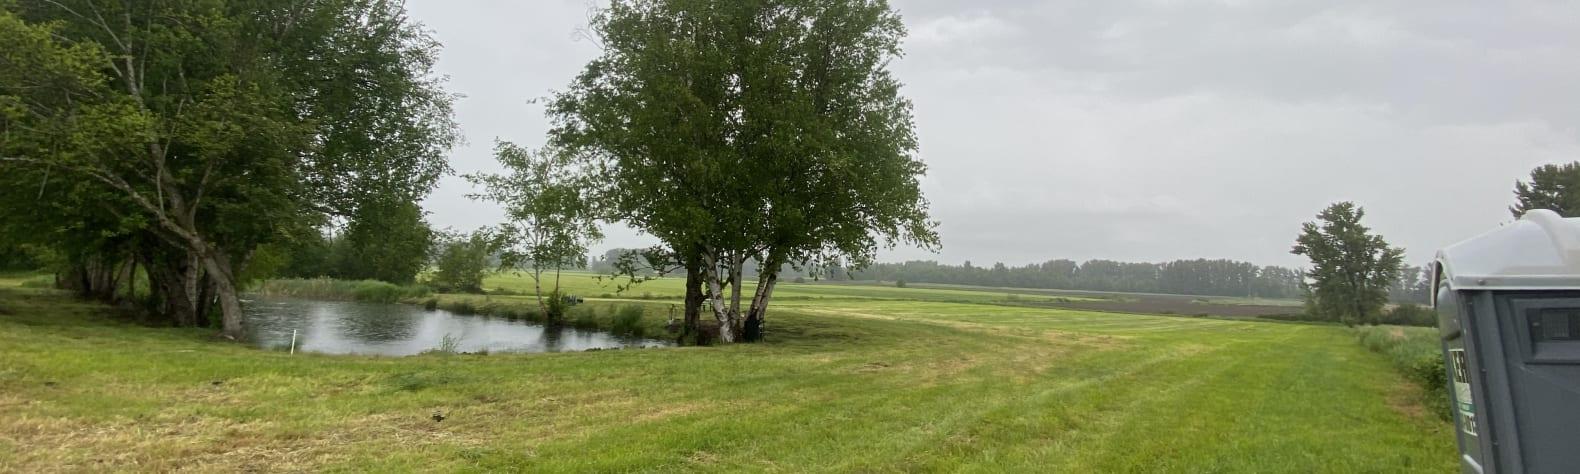 June Bud Farms